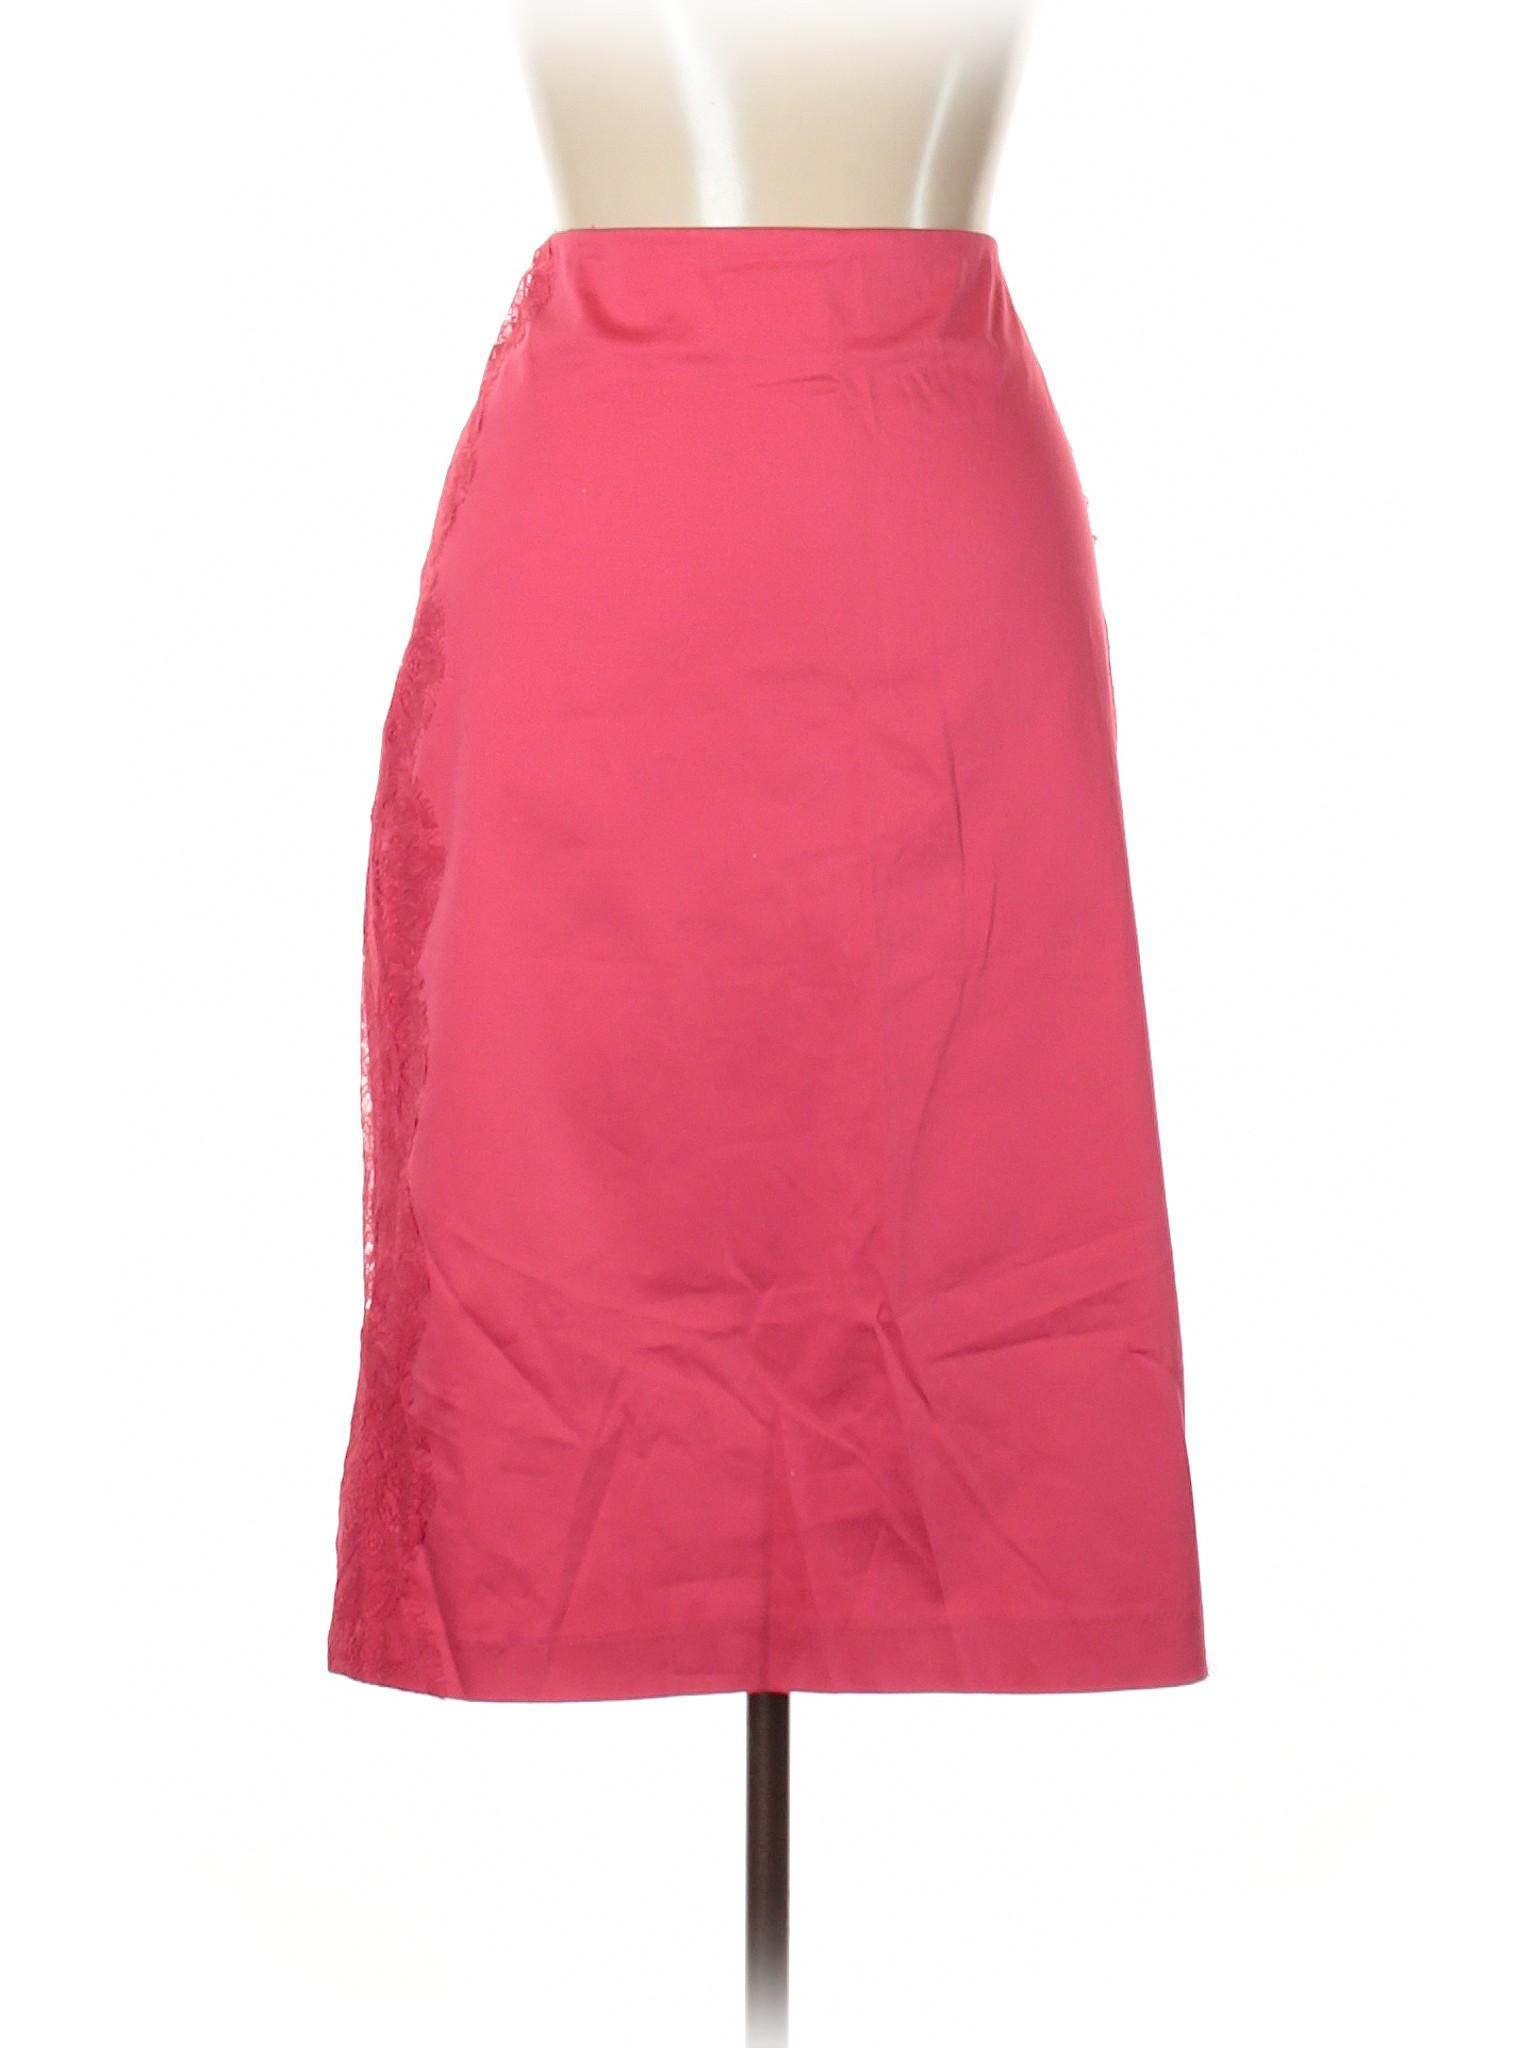 Skirt Casual Boutique Casual Skirt Boutique Casual Skirt Boutique Boutique 5O4wa